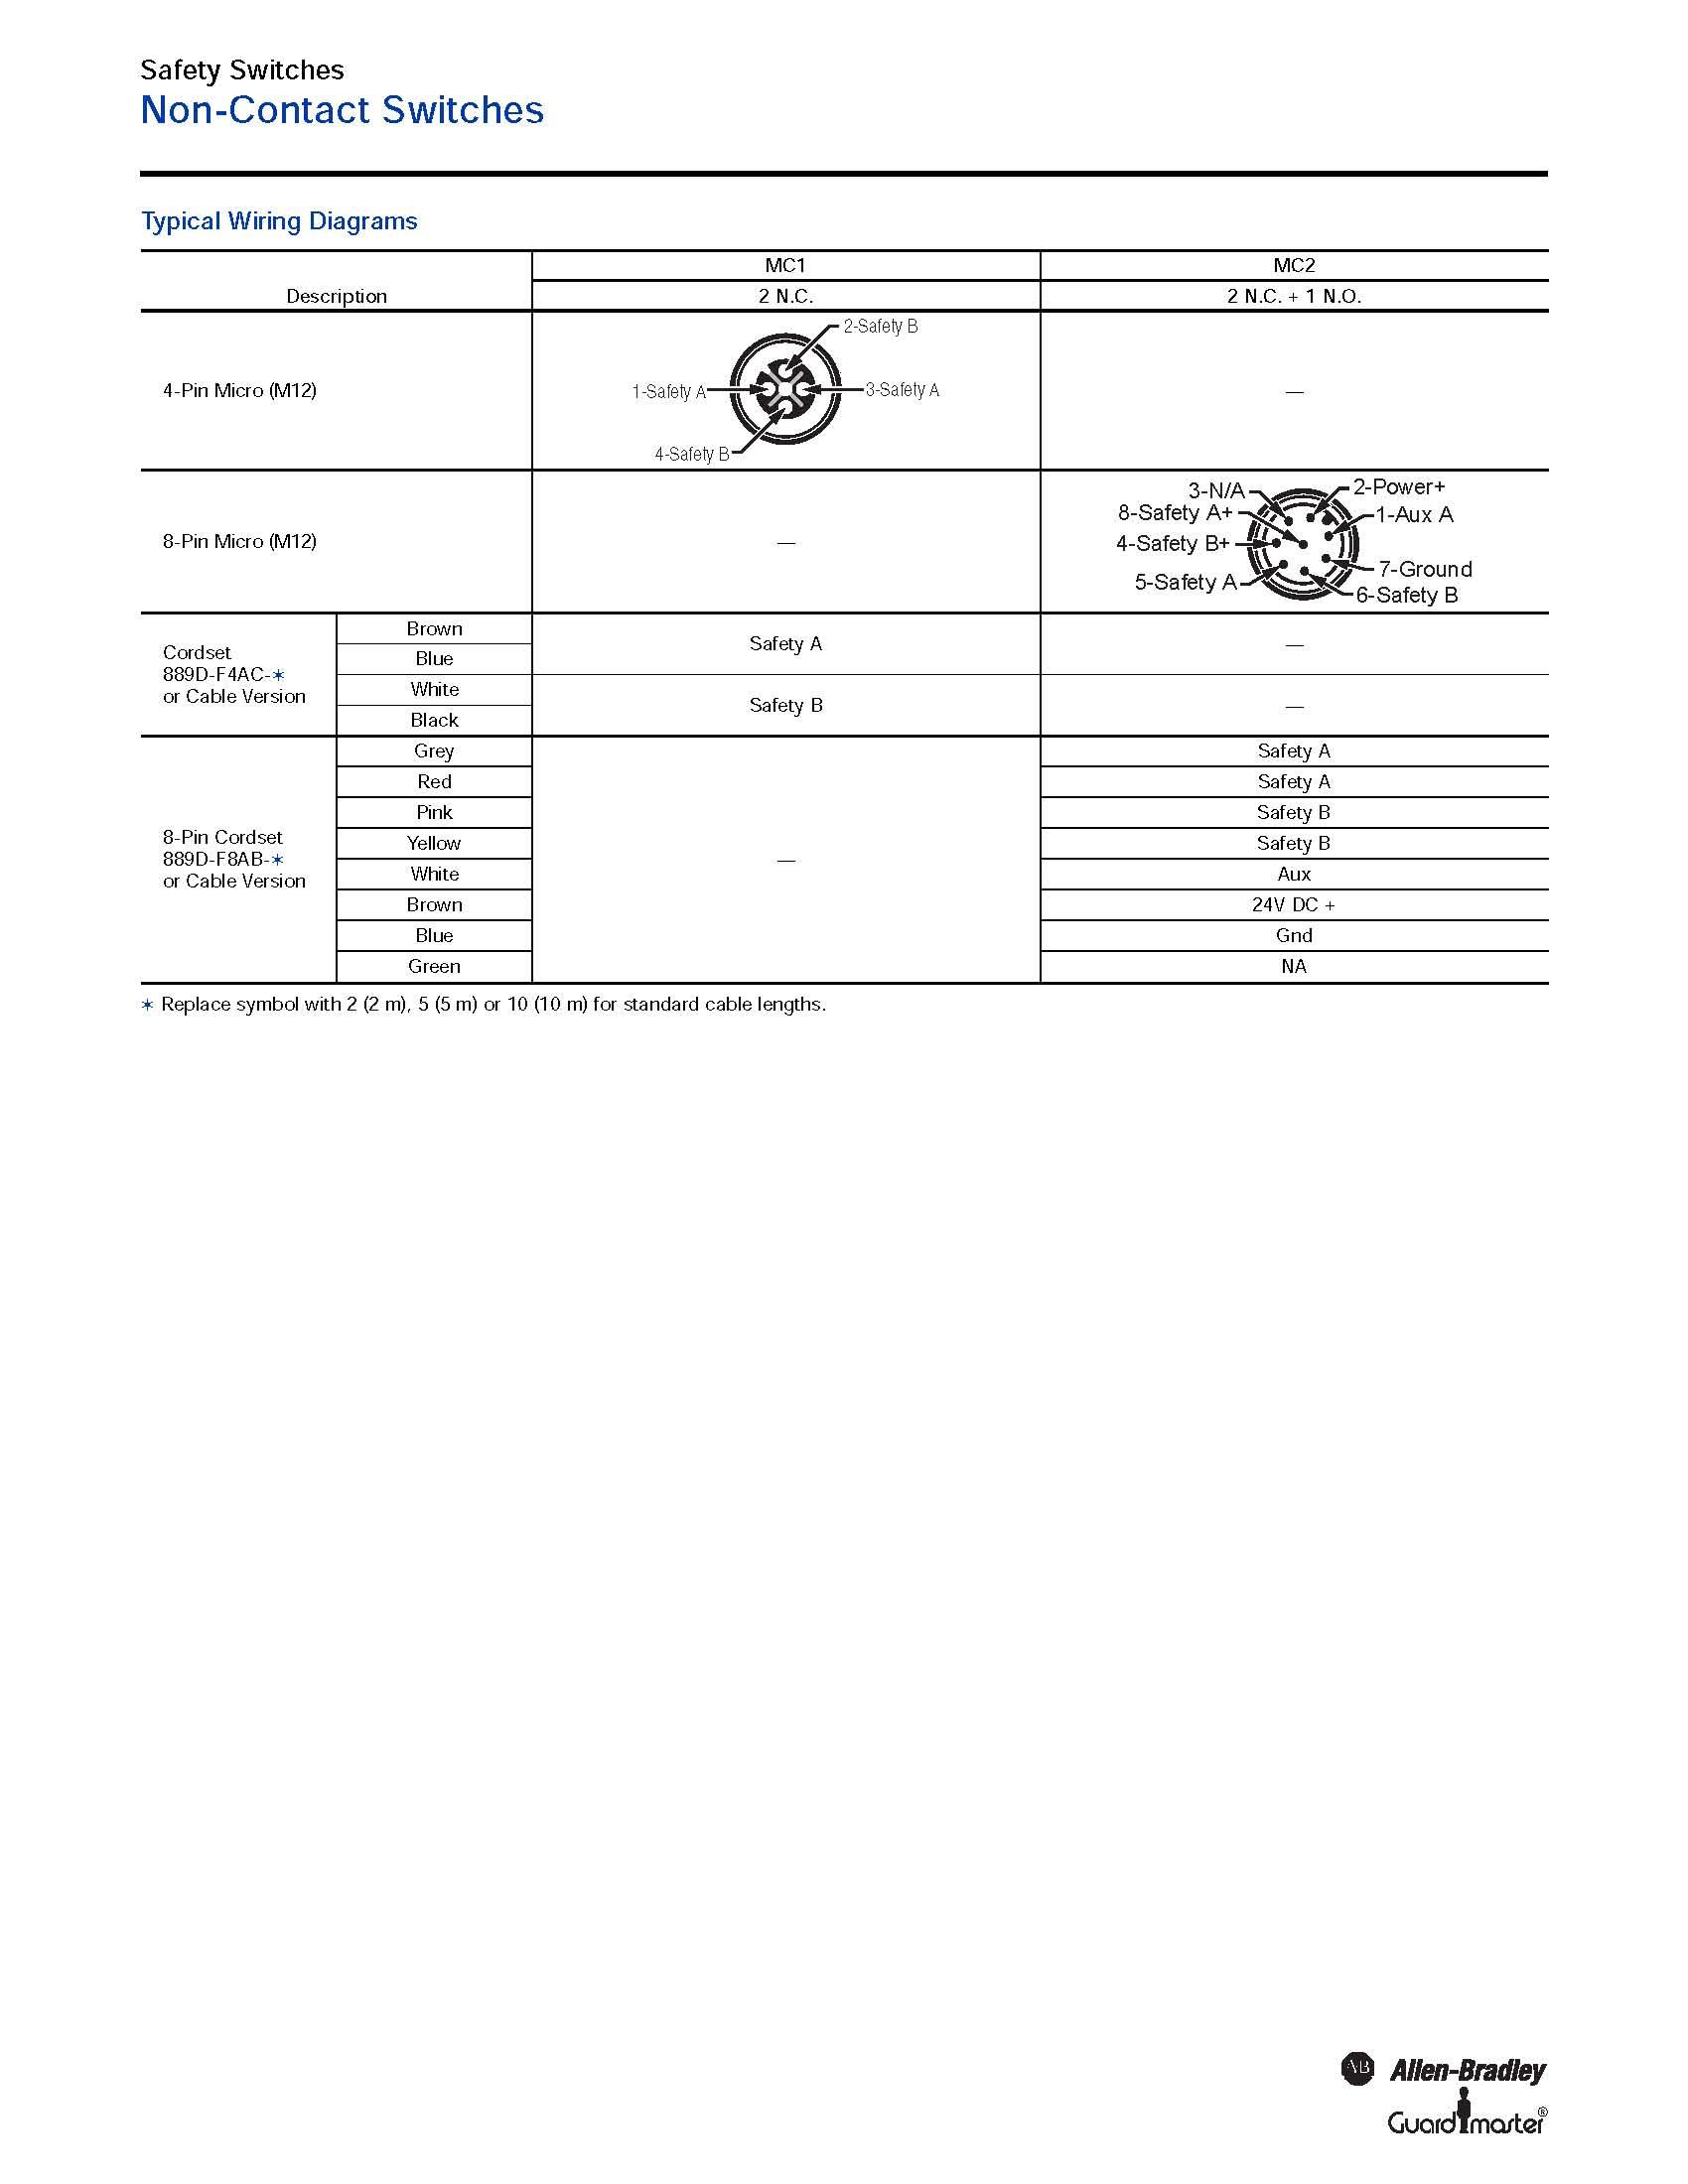 M12 Wiring Diagram Library Viper Alarm Car 560vx A B 440nz2nrs1c Switch